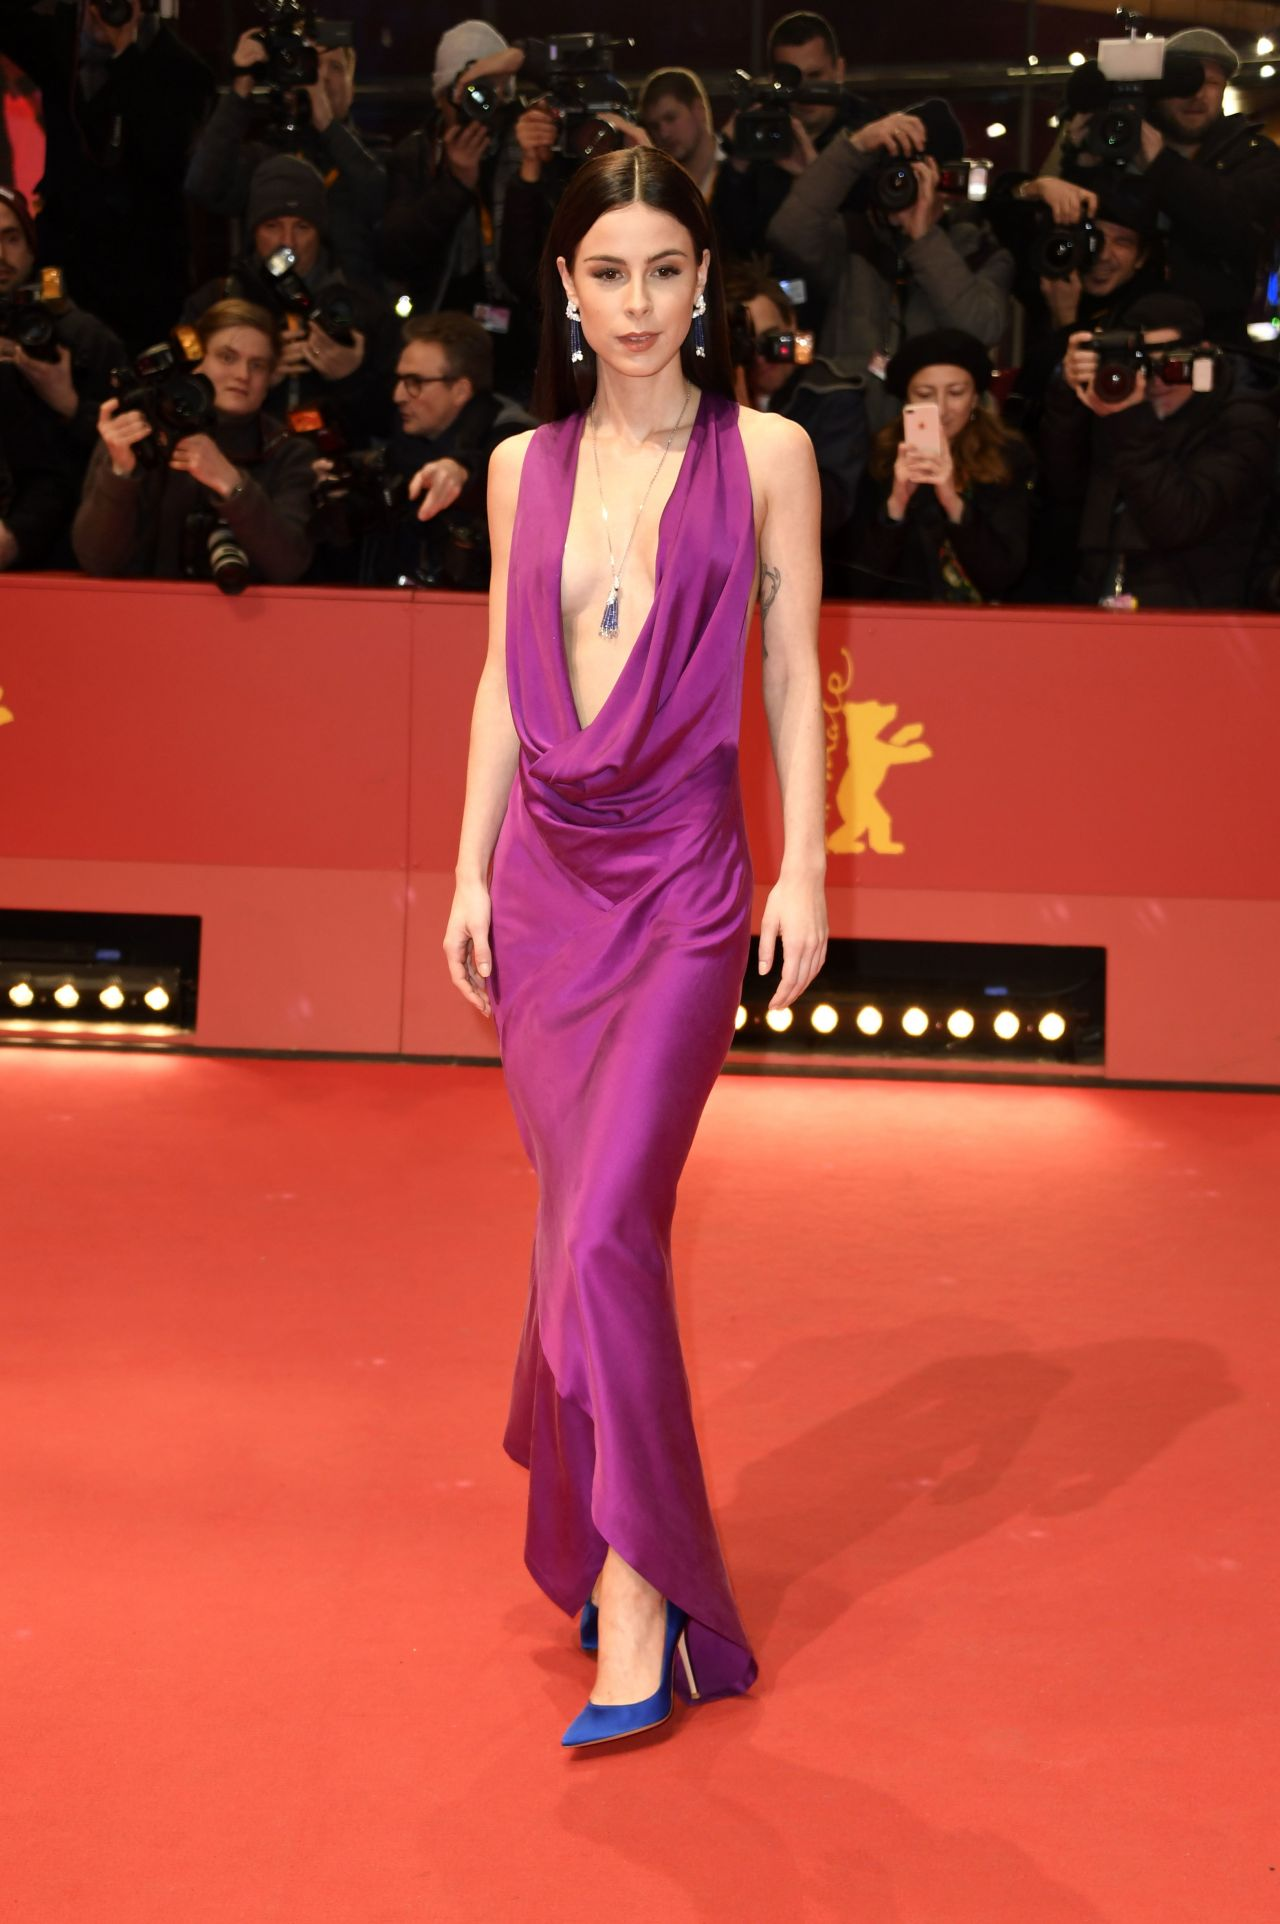 Lena Meyer-Landrut - 3 Days in Quiberon Premiere at